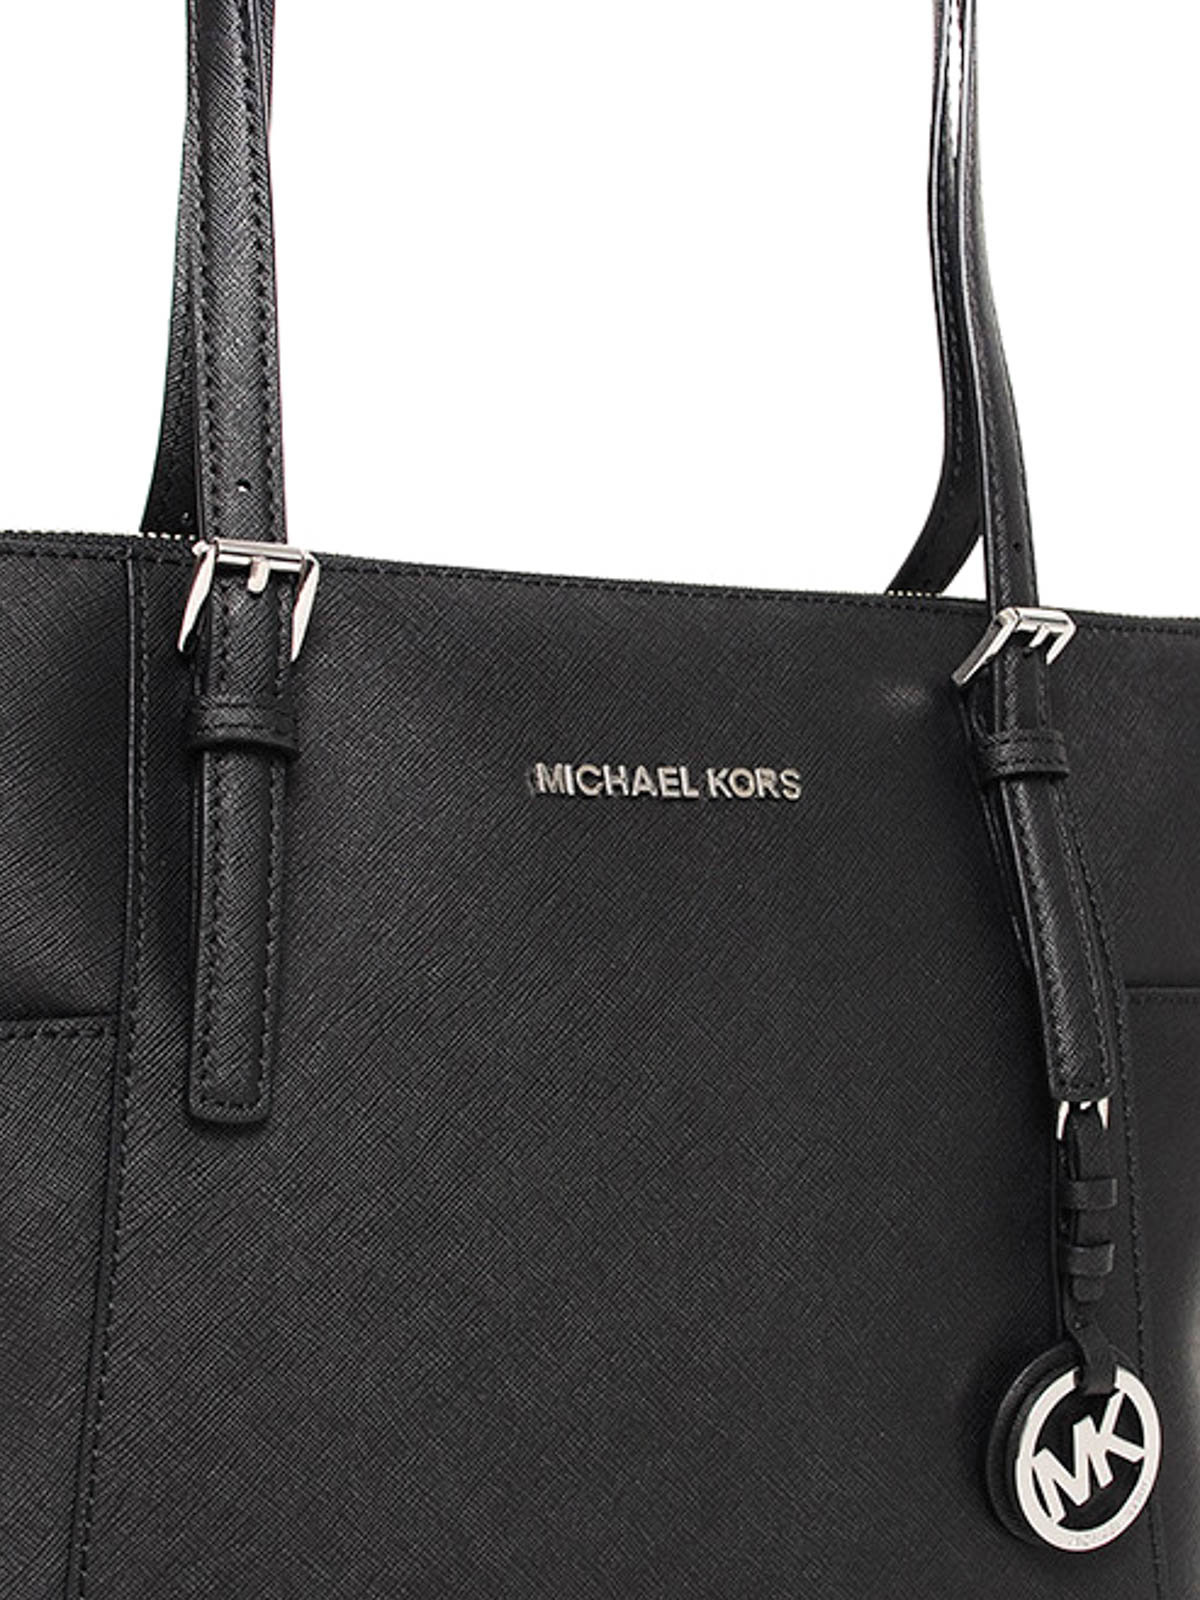 5f37444499408a Michael Kors - Jet Set Item tote - totes bags - 30F2STTT8L 001 ...